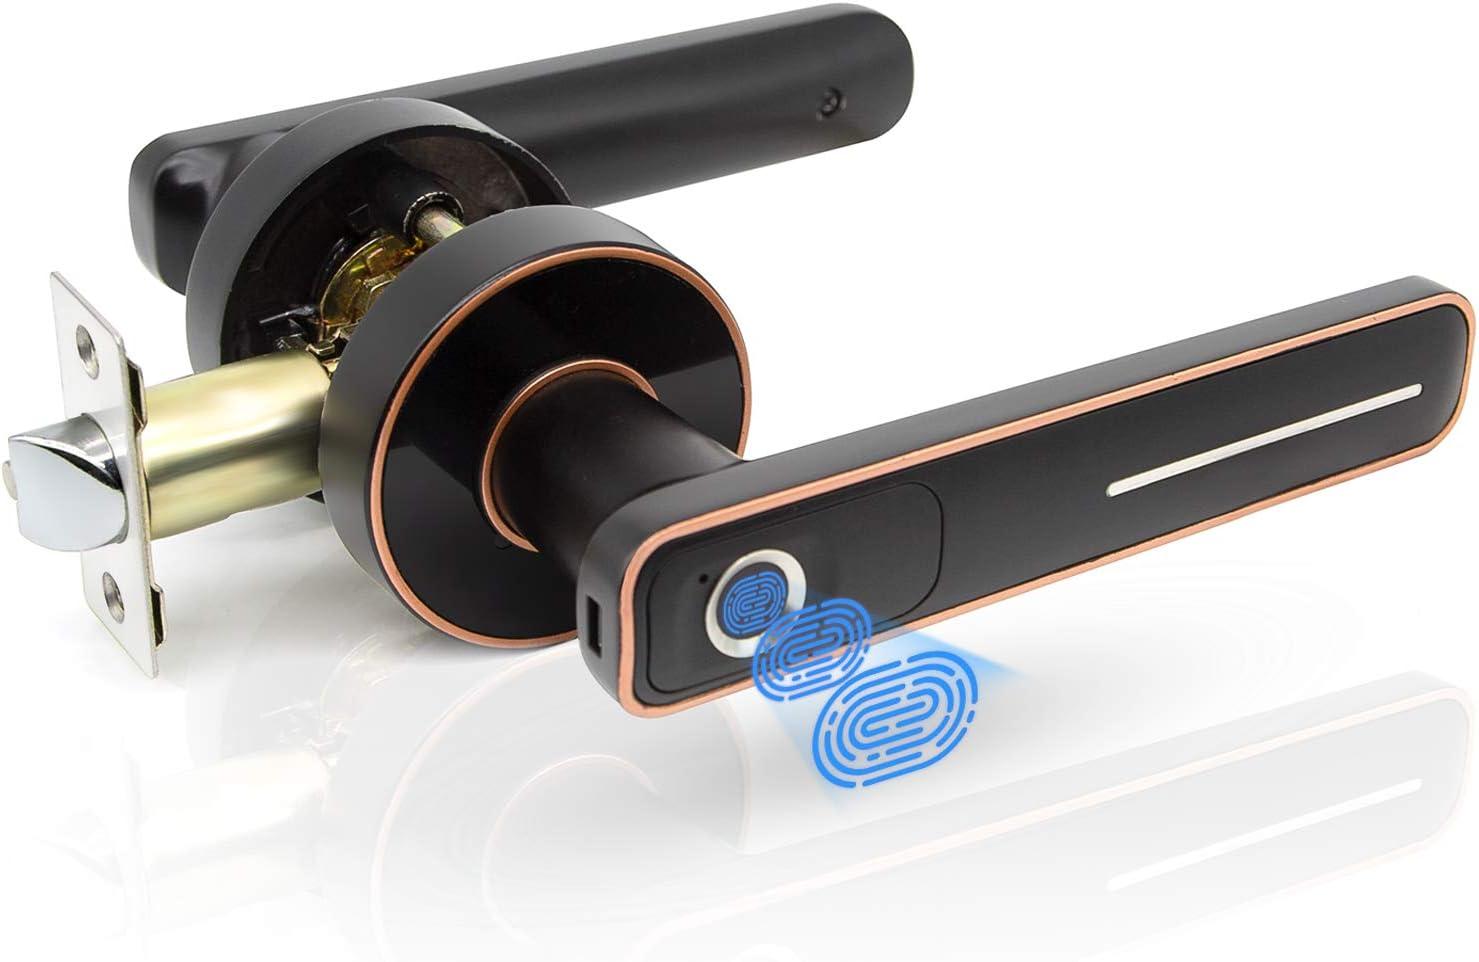 Geek Smart Fingerprint Door High order L Entry 67% OFF of fixed price Keyless Lock